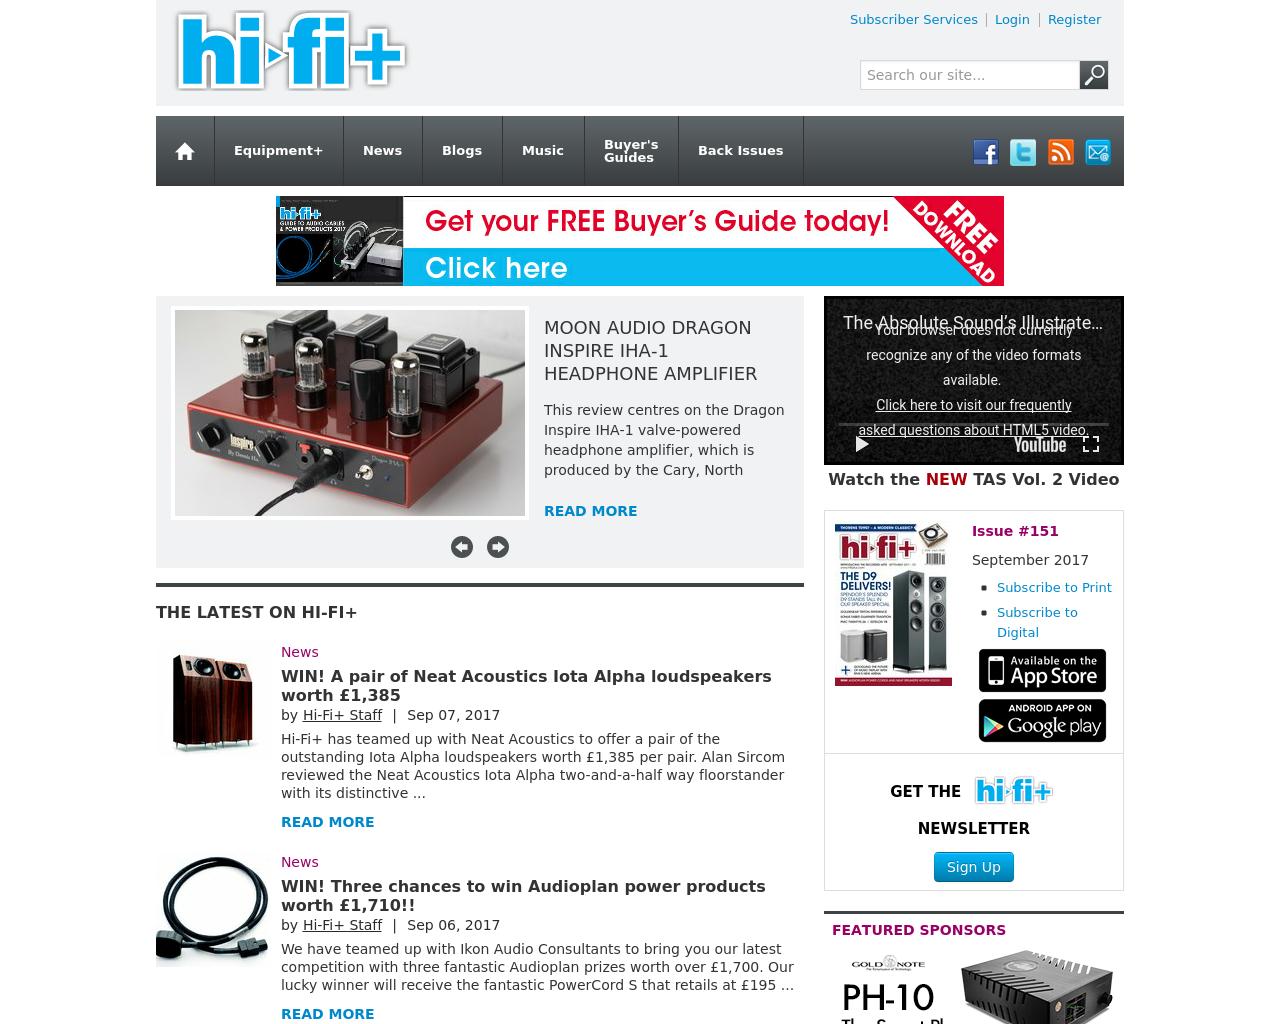 Hi-Fi-+-Advertising-Reviews-Pricing